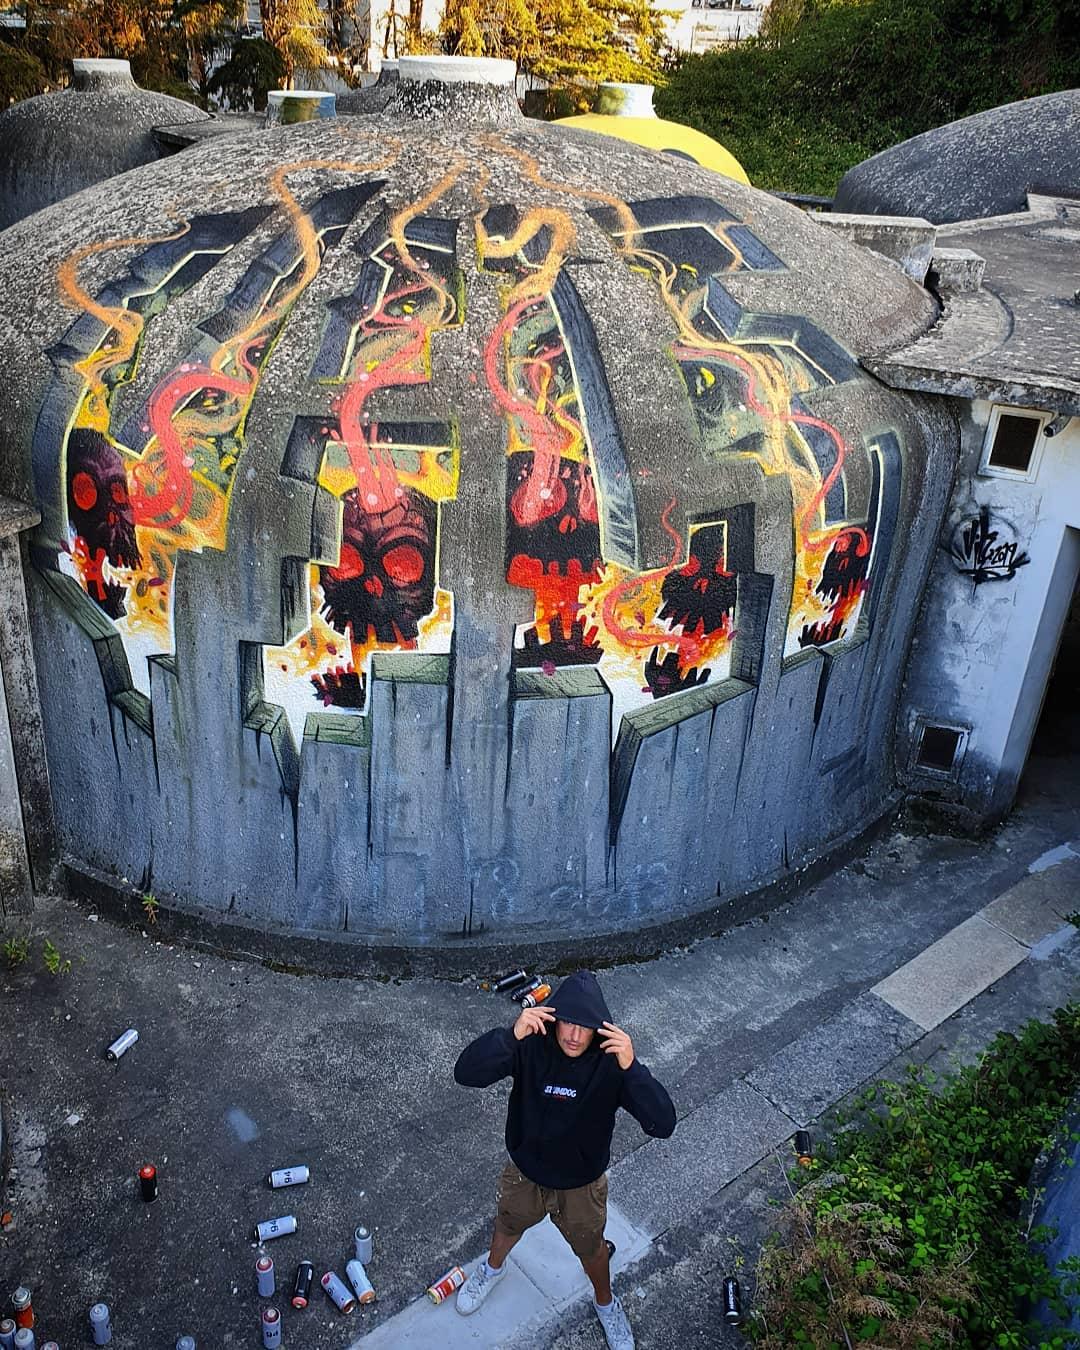 Illusion Art by Vile Graffiti